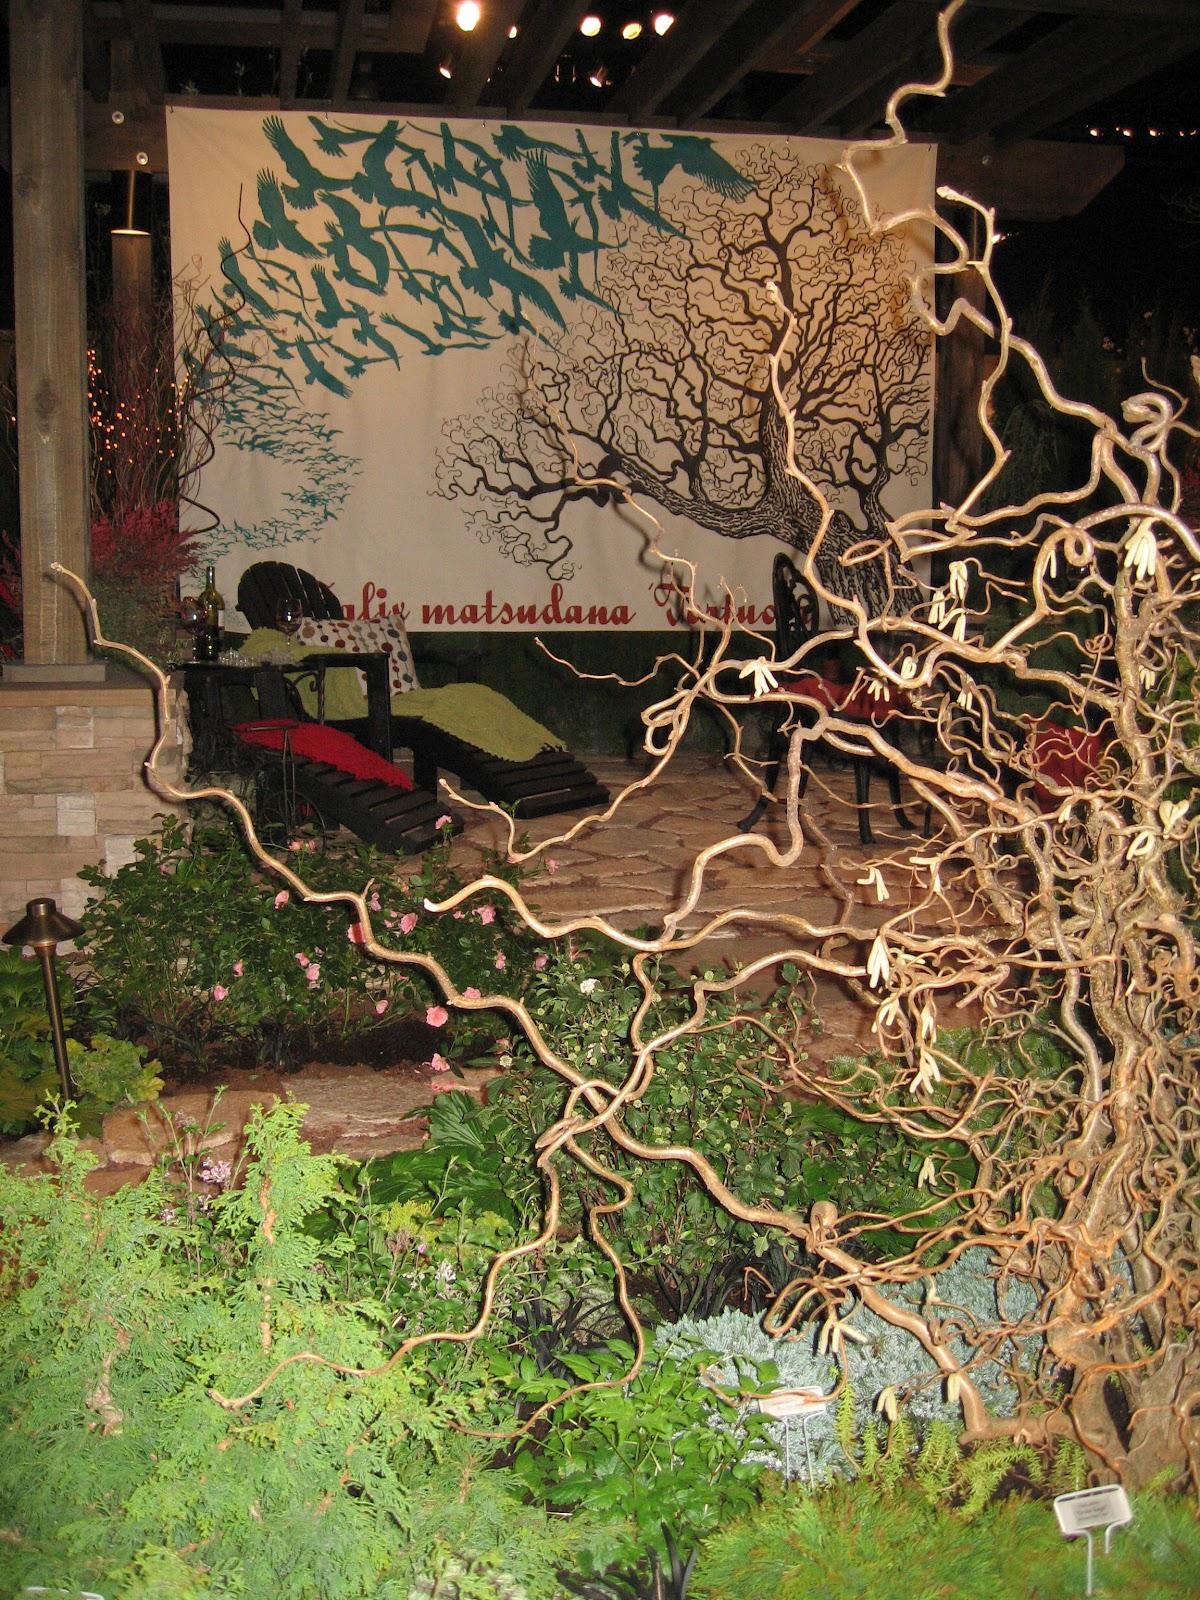 Kgk Gardening Landscape: Polka Dot Galoshes: Plants + Music + Discovery = One